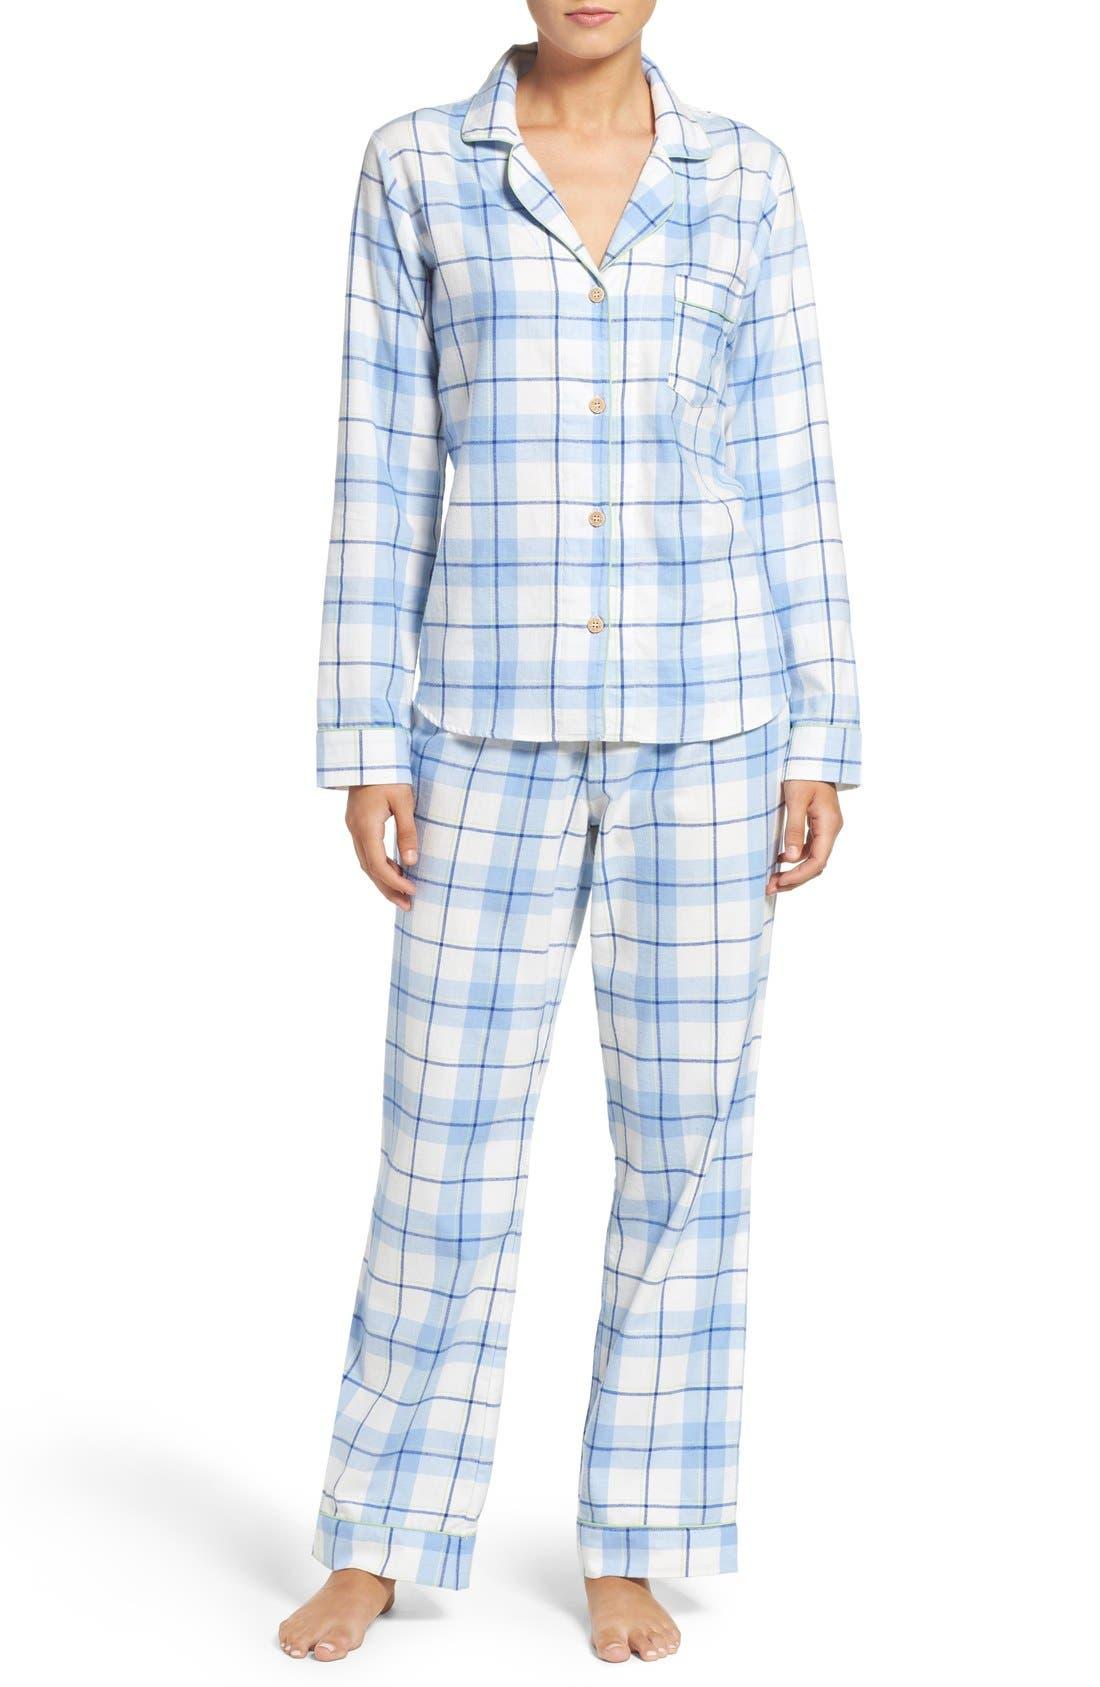 Main Image - UGG® 'Raven' Plaid Cotton Pajamas